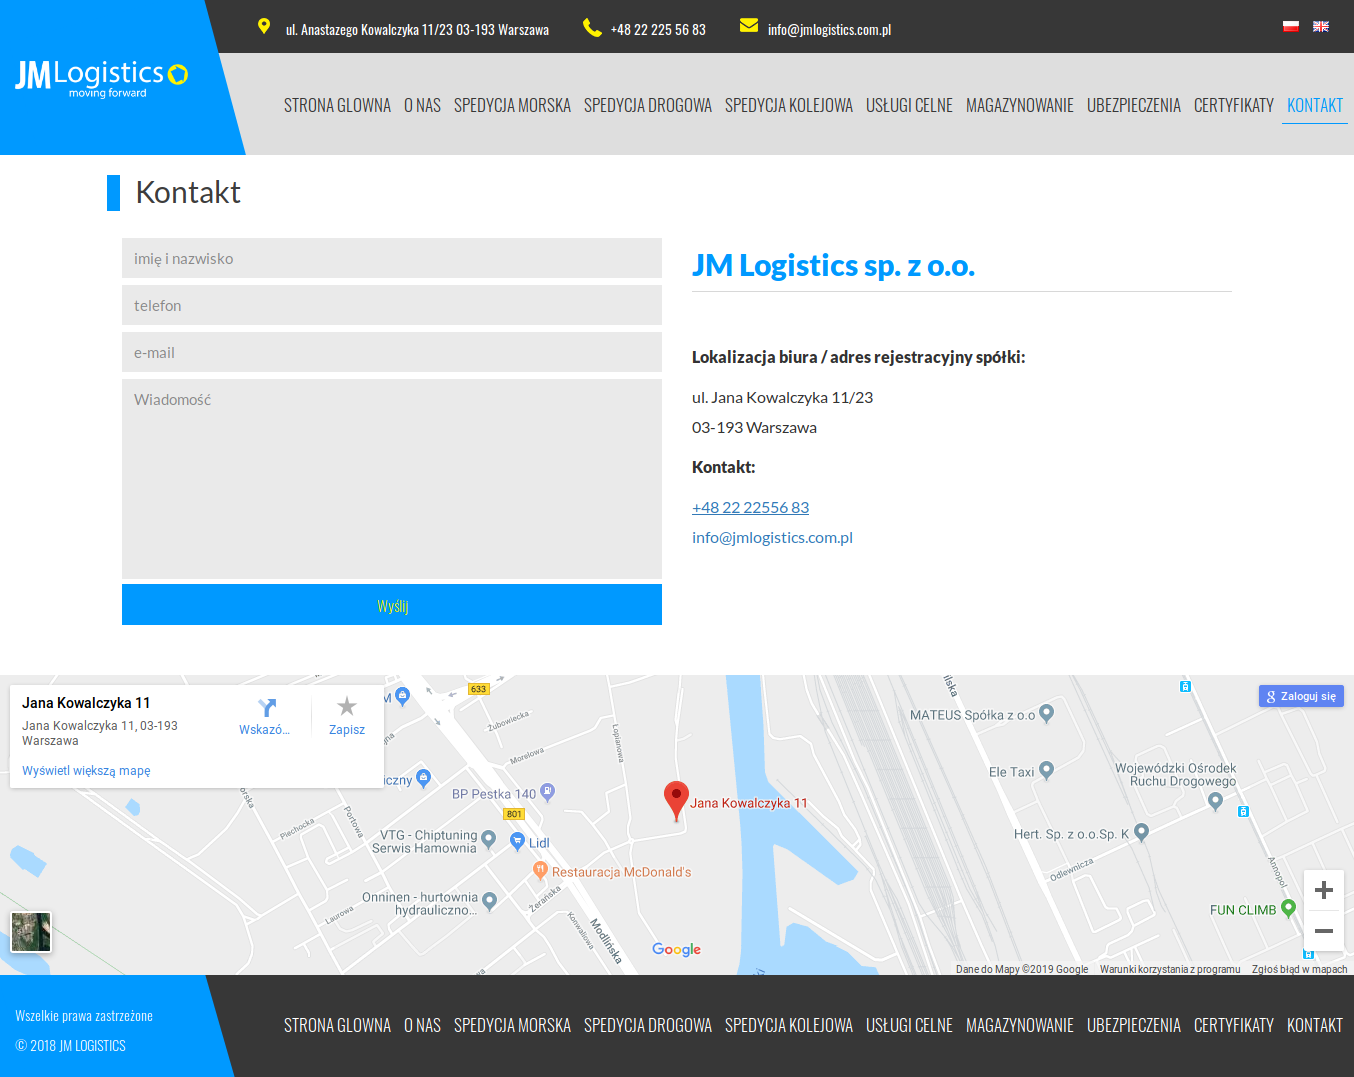 JMLogistics.pl-kontakt